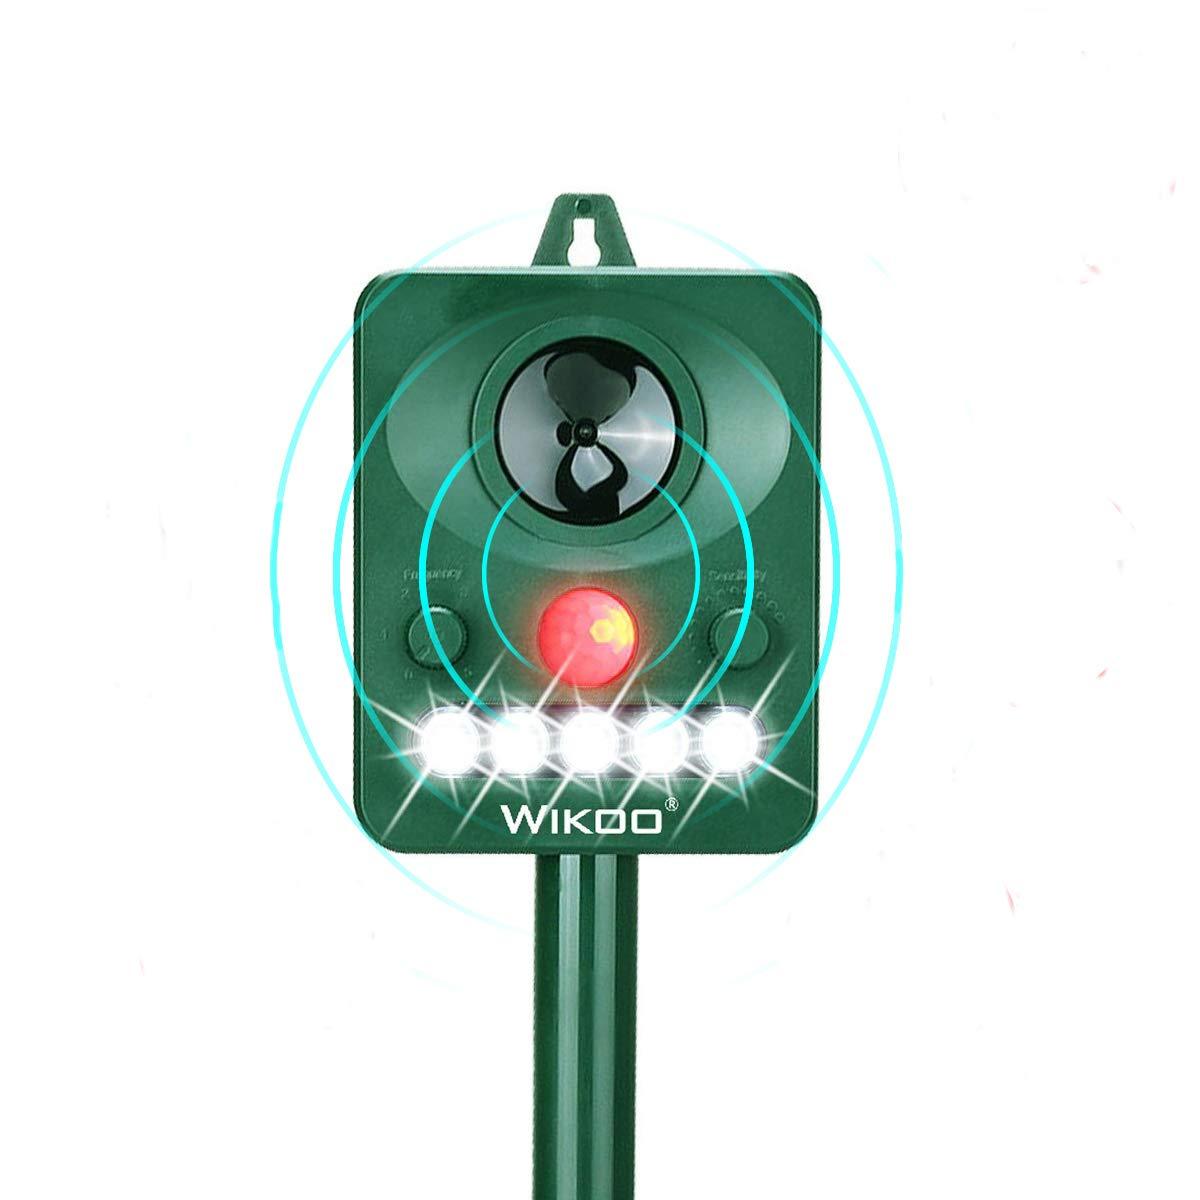 FRYZOO Ultrasonic Solar Pest Repellent